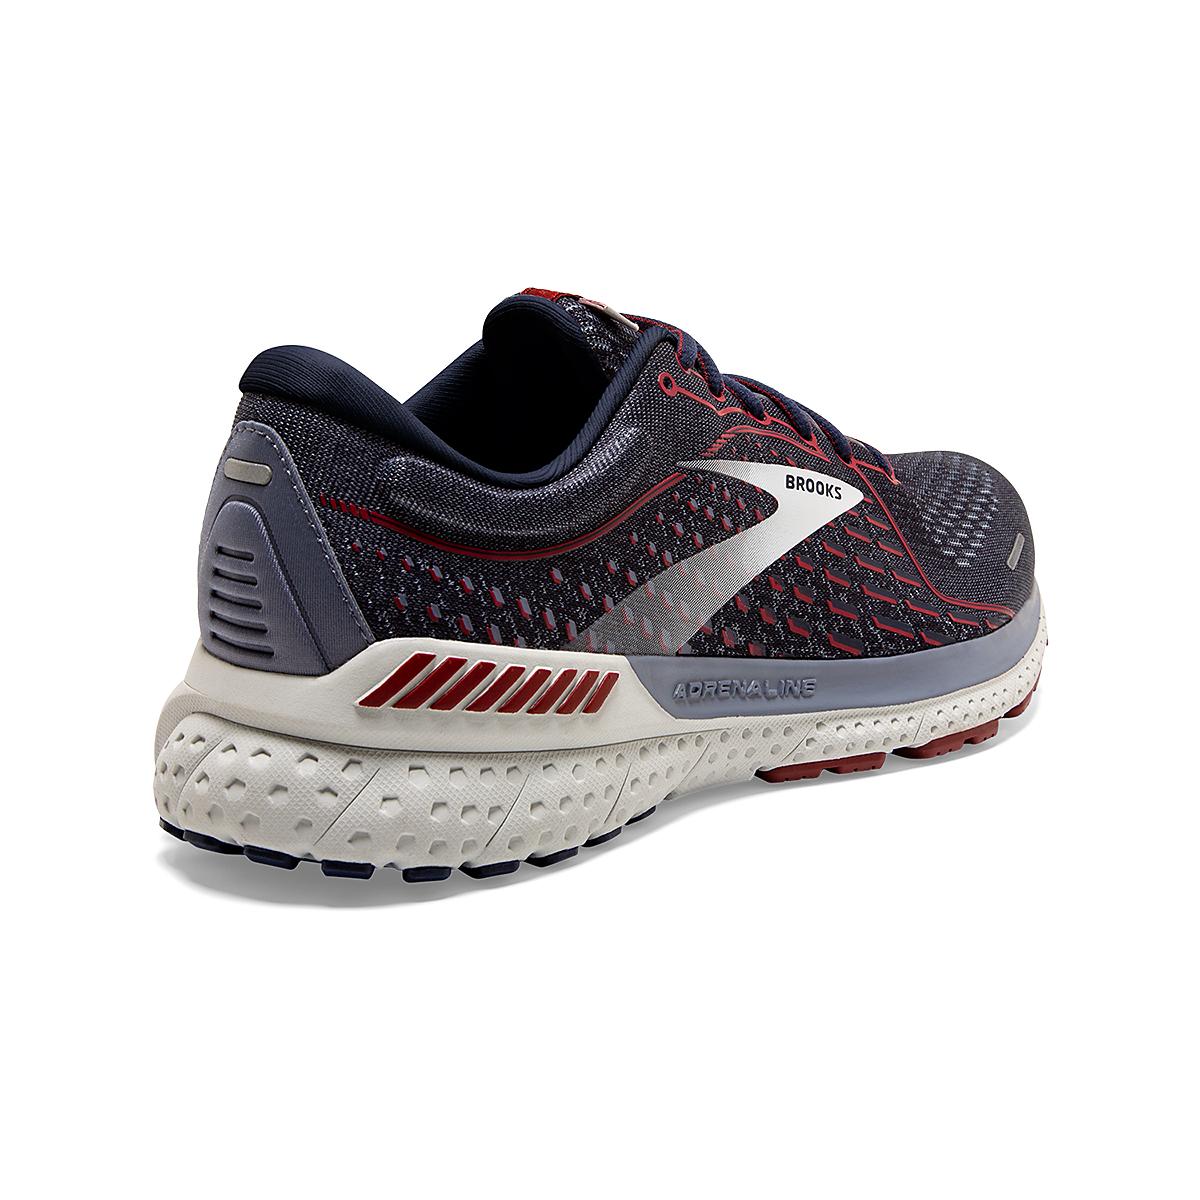 Men's Brooks Adrenaline GTS 21 Running Shoe - Color: Peacoat/Grey/Red - Size: 7 - Width: Regular, Peacoat/Grey/Red, large, image 5